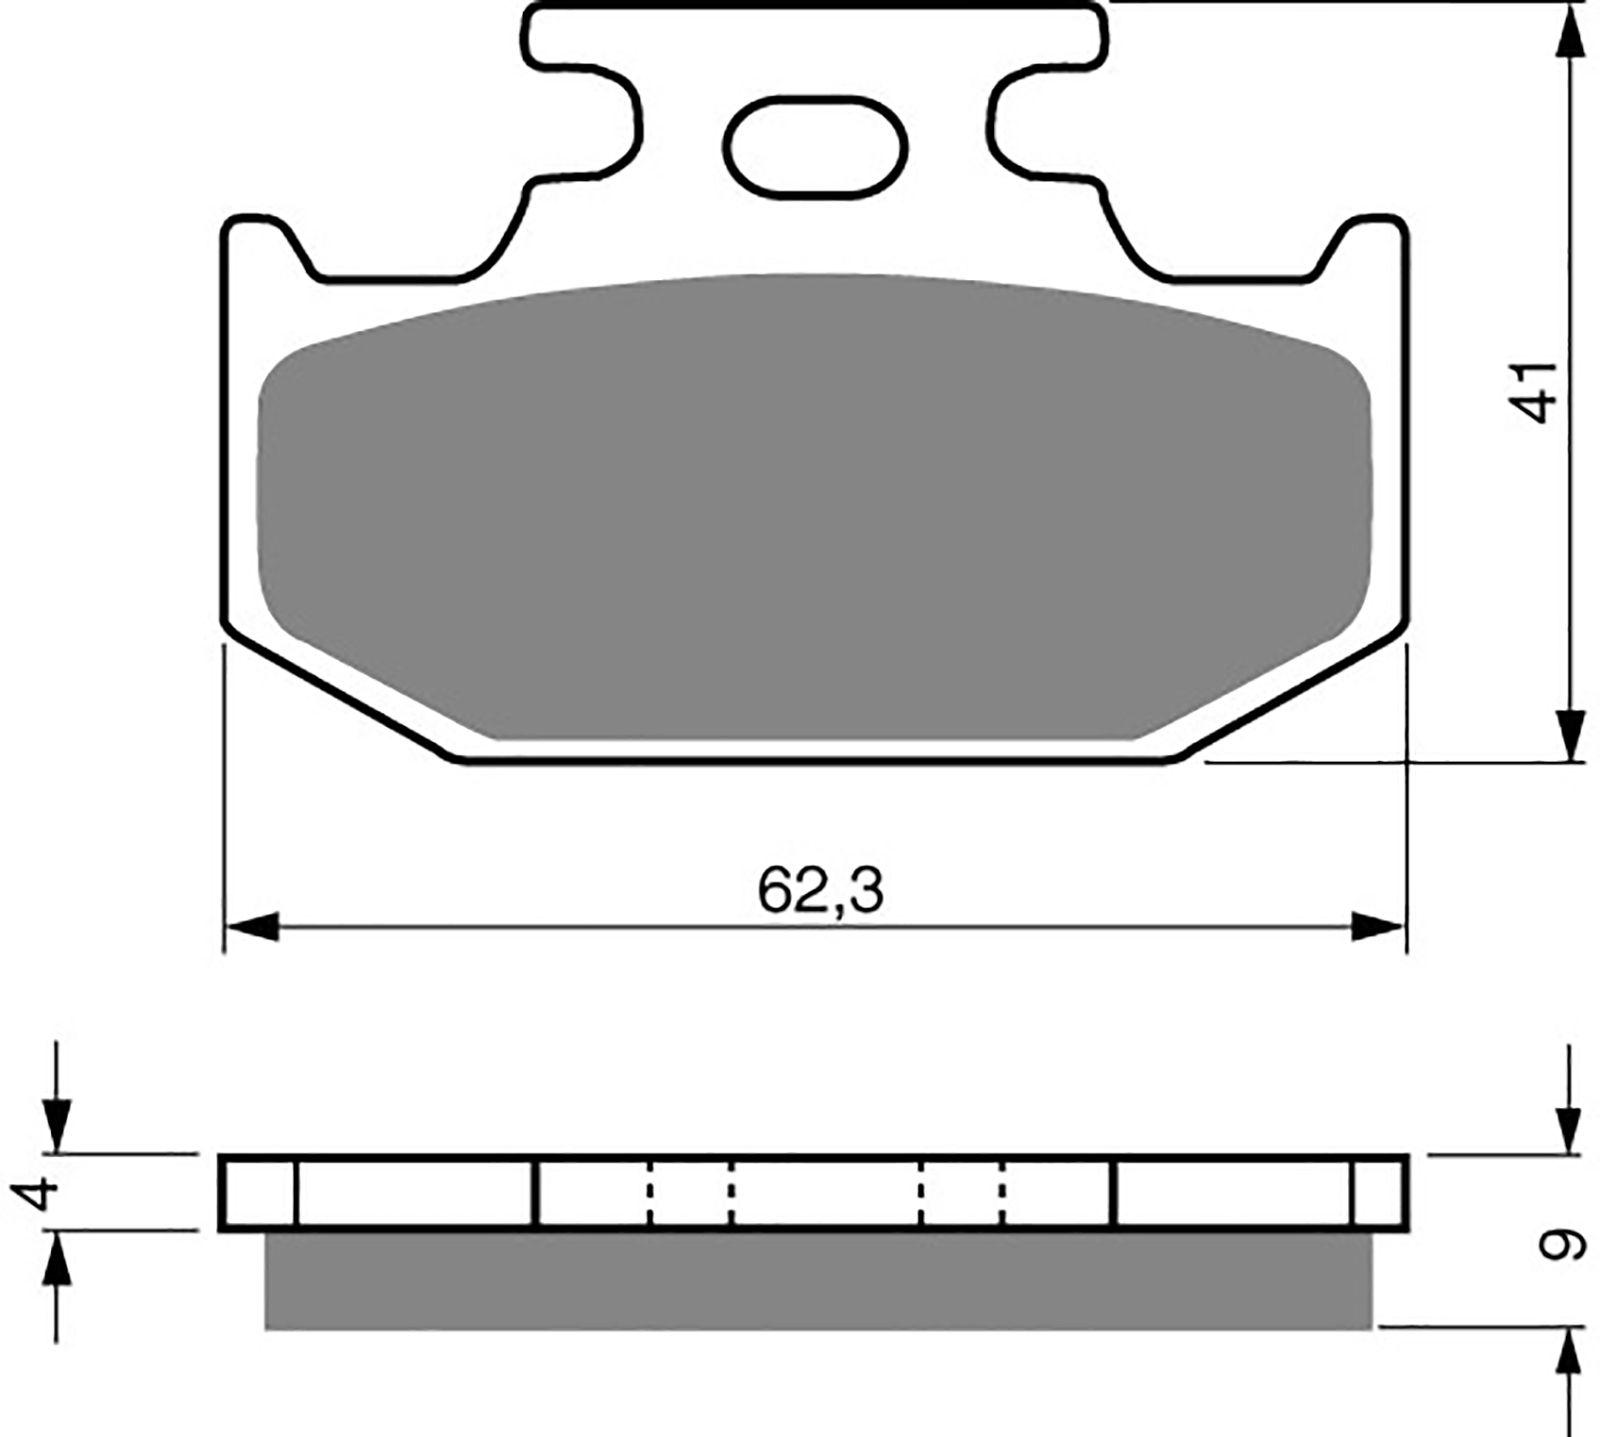 goldfren s33 brake pads - 700001GS image